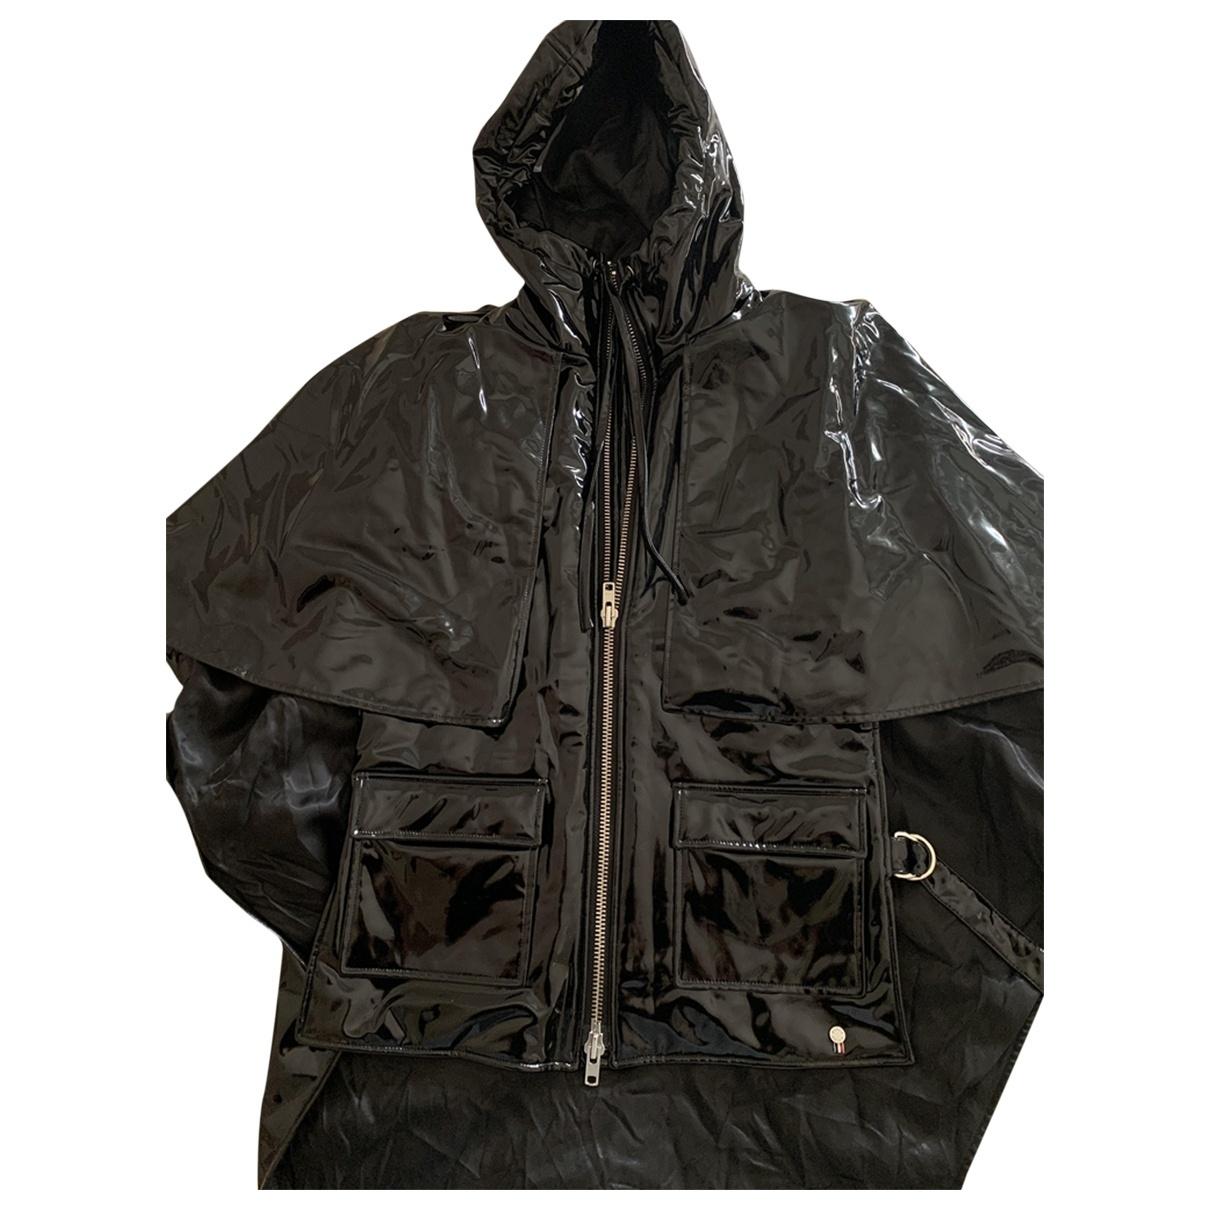 Wanda Nylon \N Black jacket for Women S International